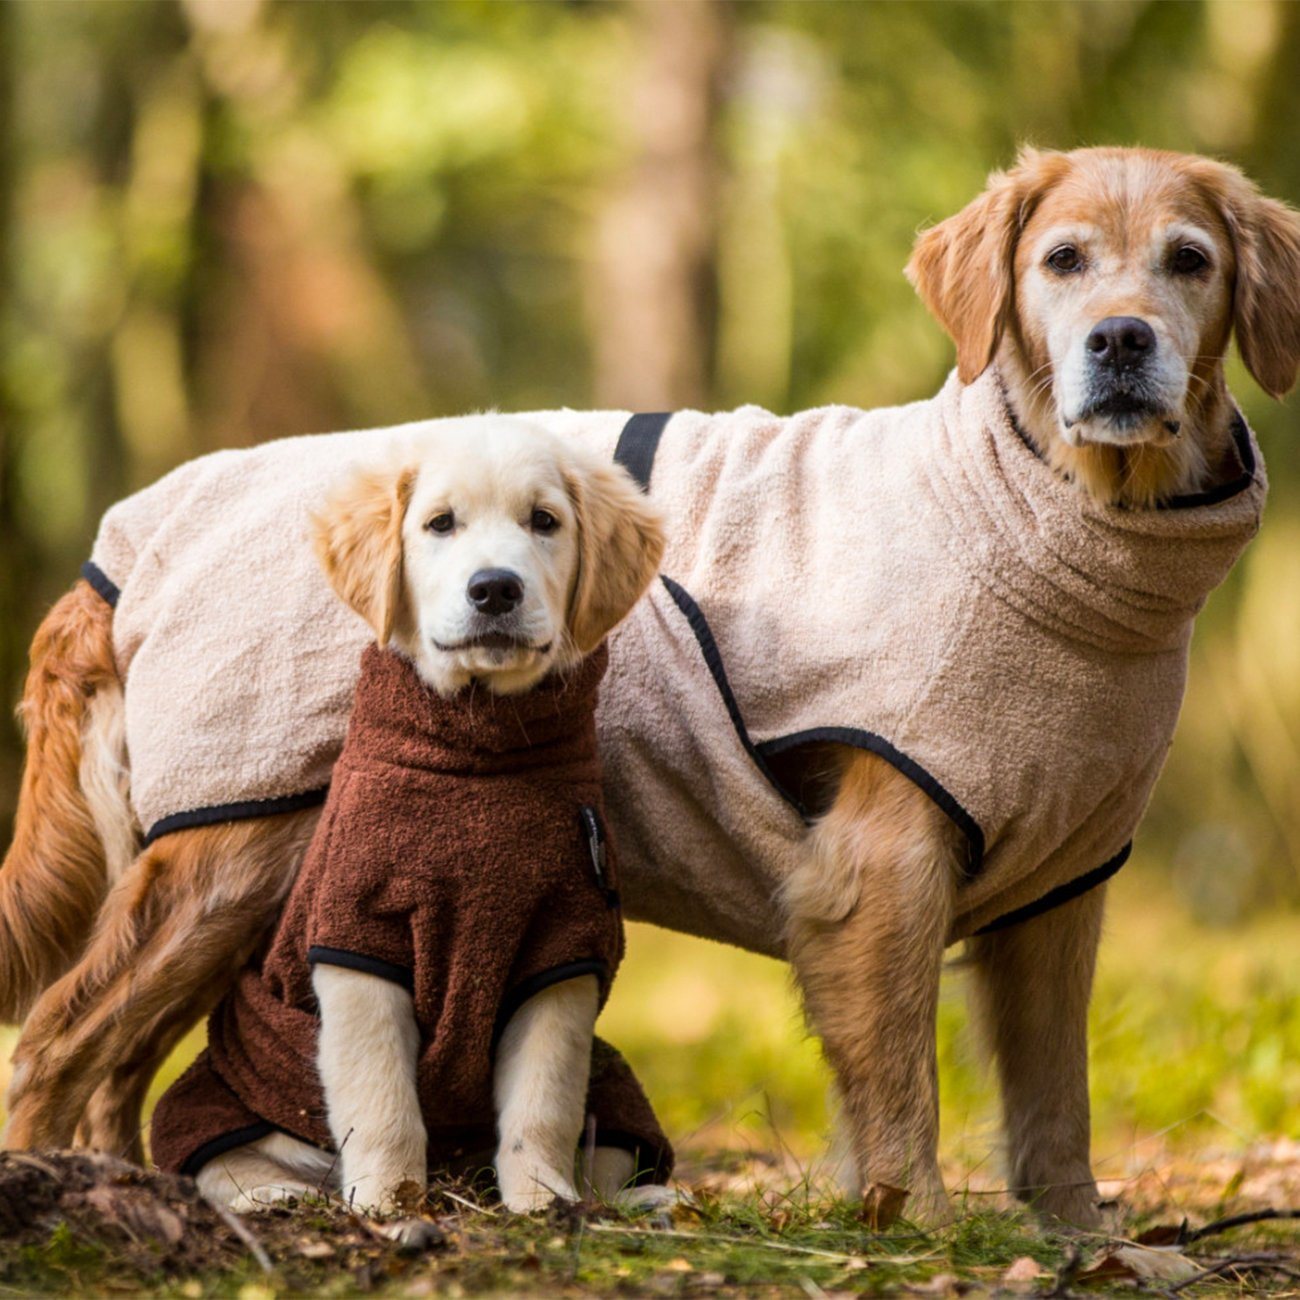 fit4dogs Trockenmantel Hund Dryup Cape, Bild 18